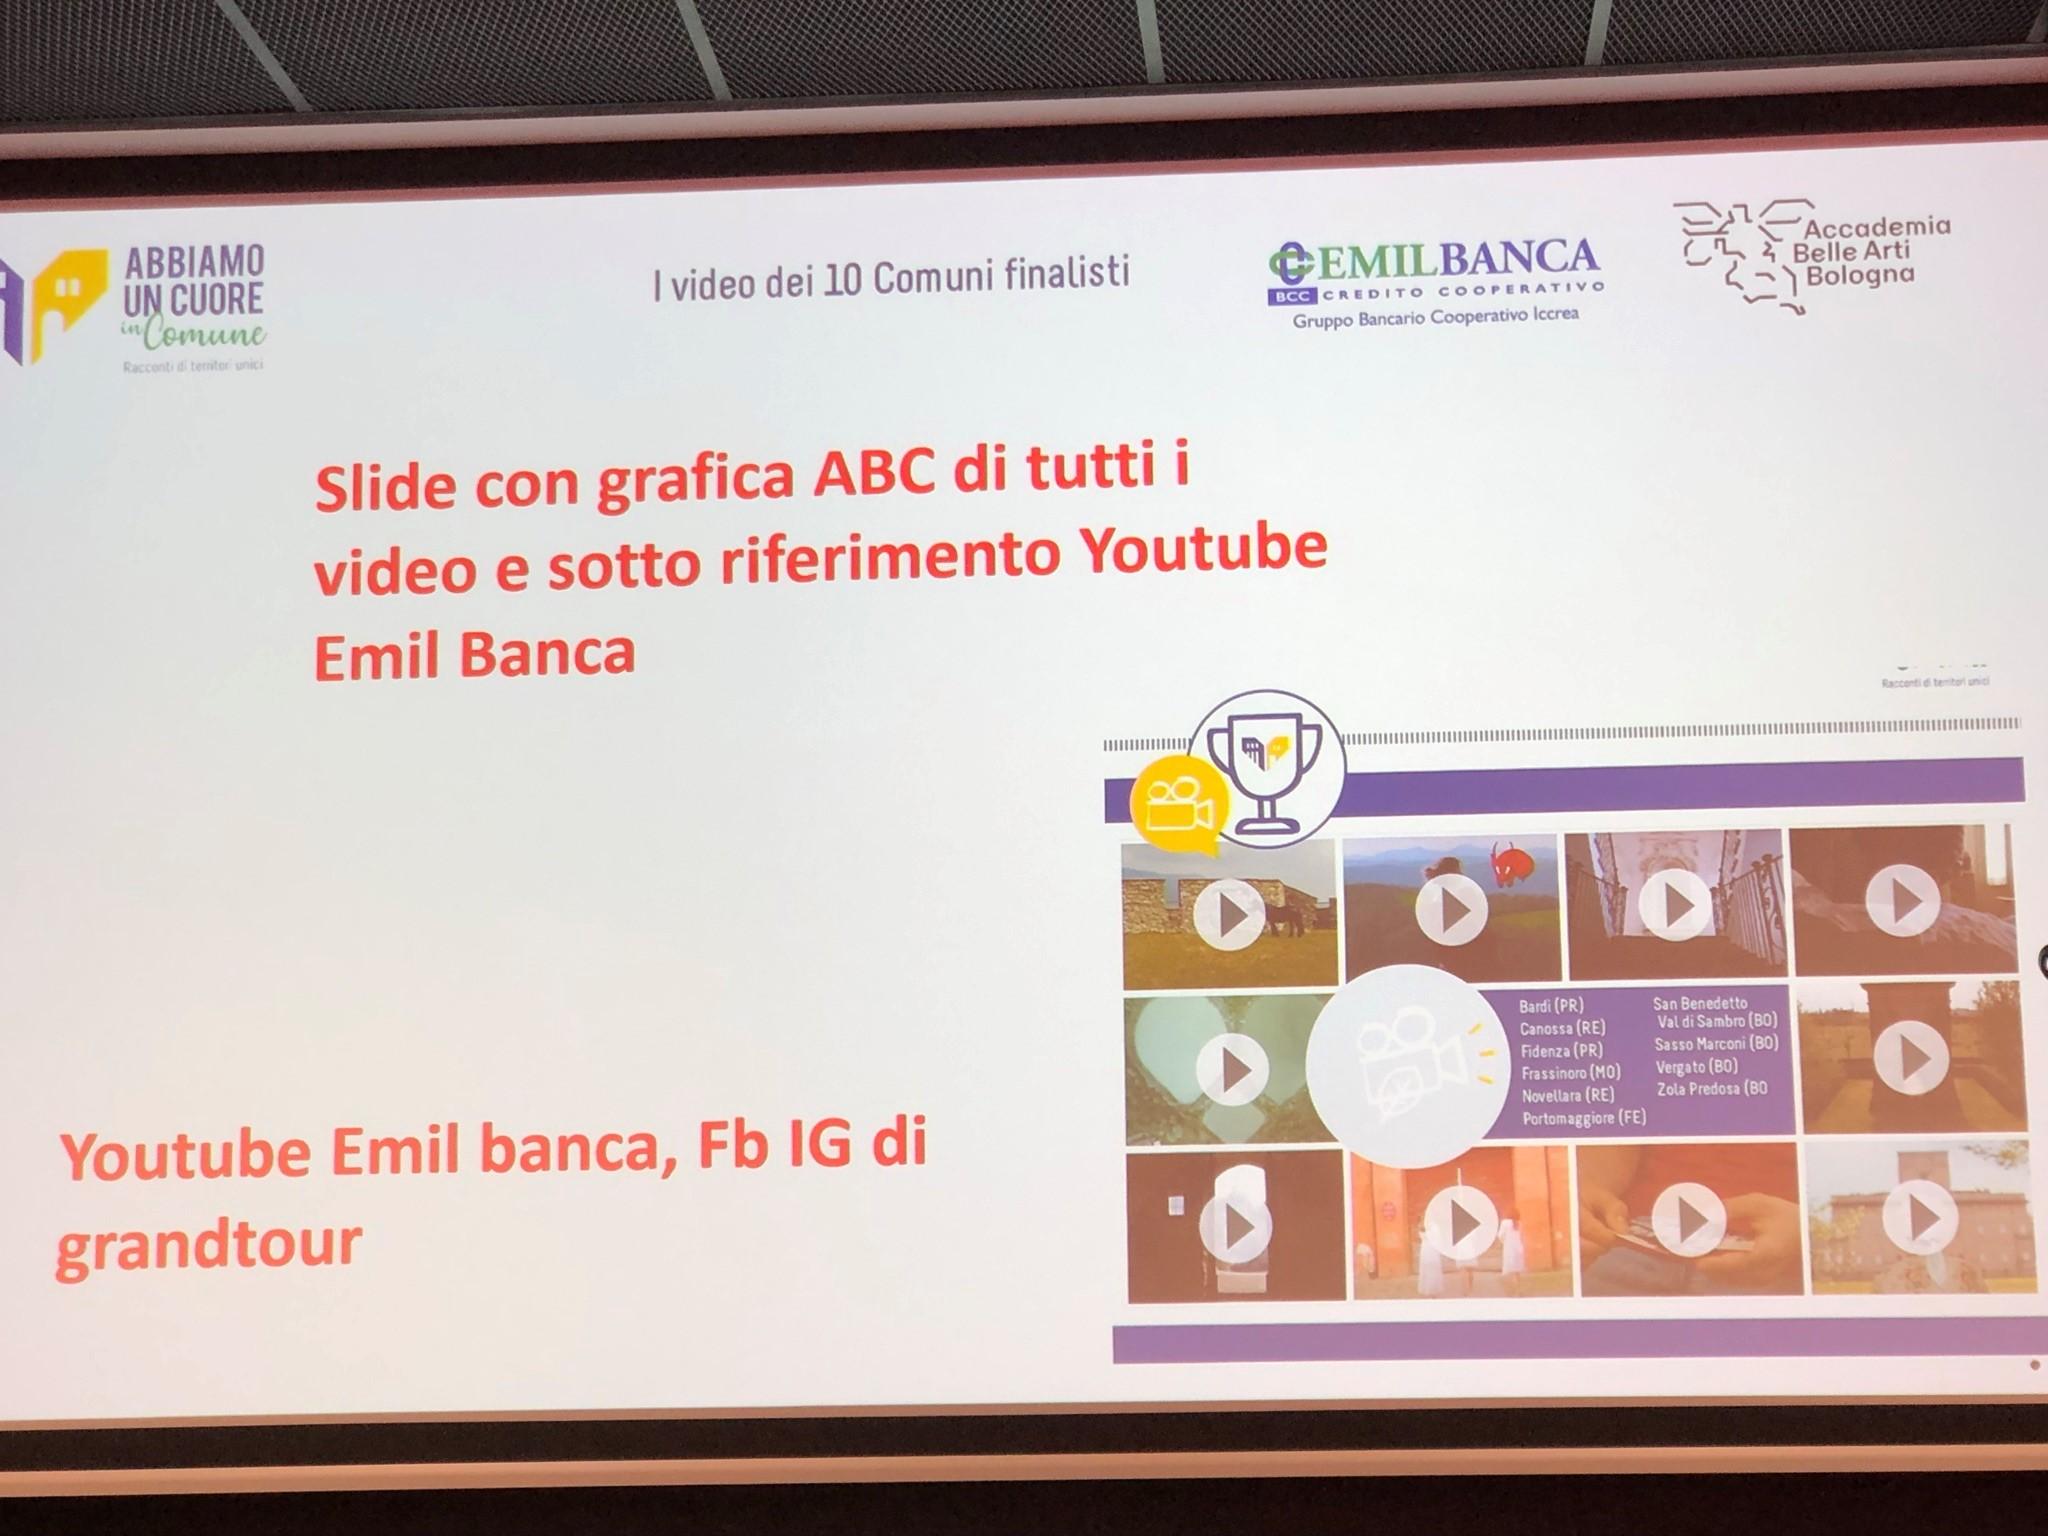 EMIL-BANCA-ABC-slide